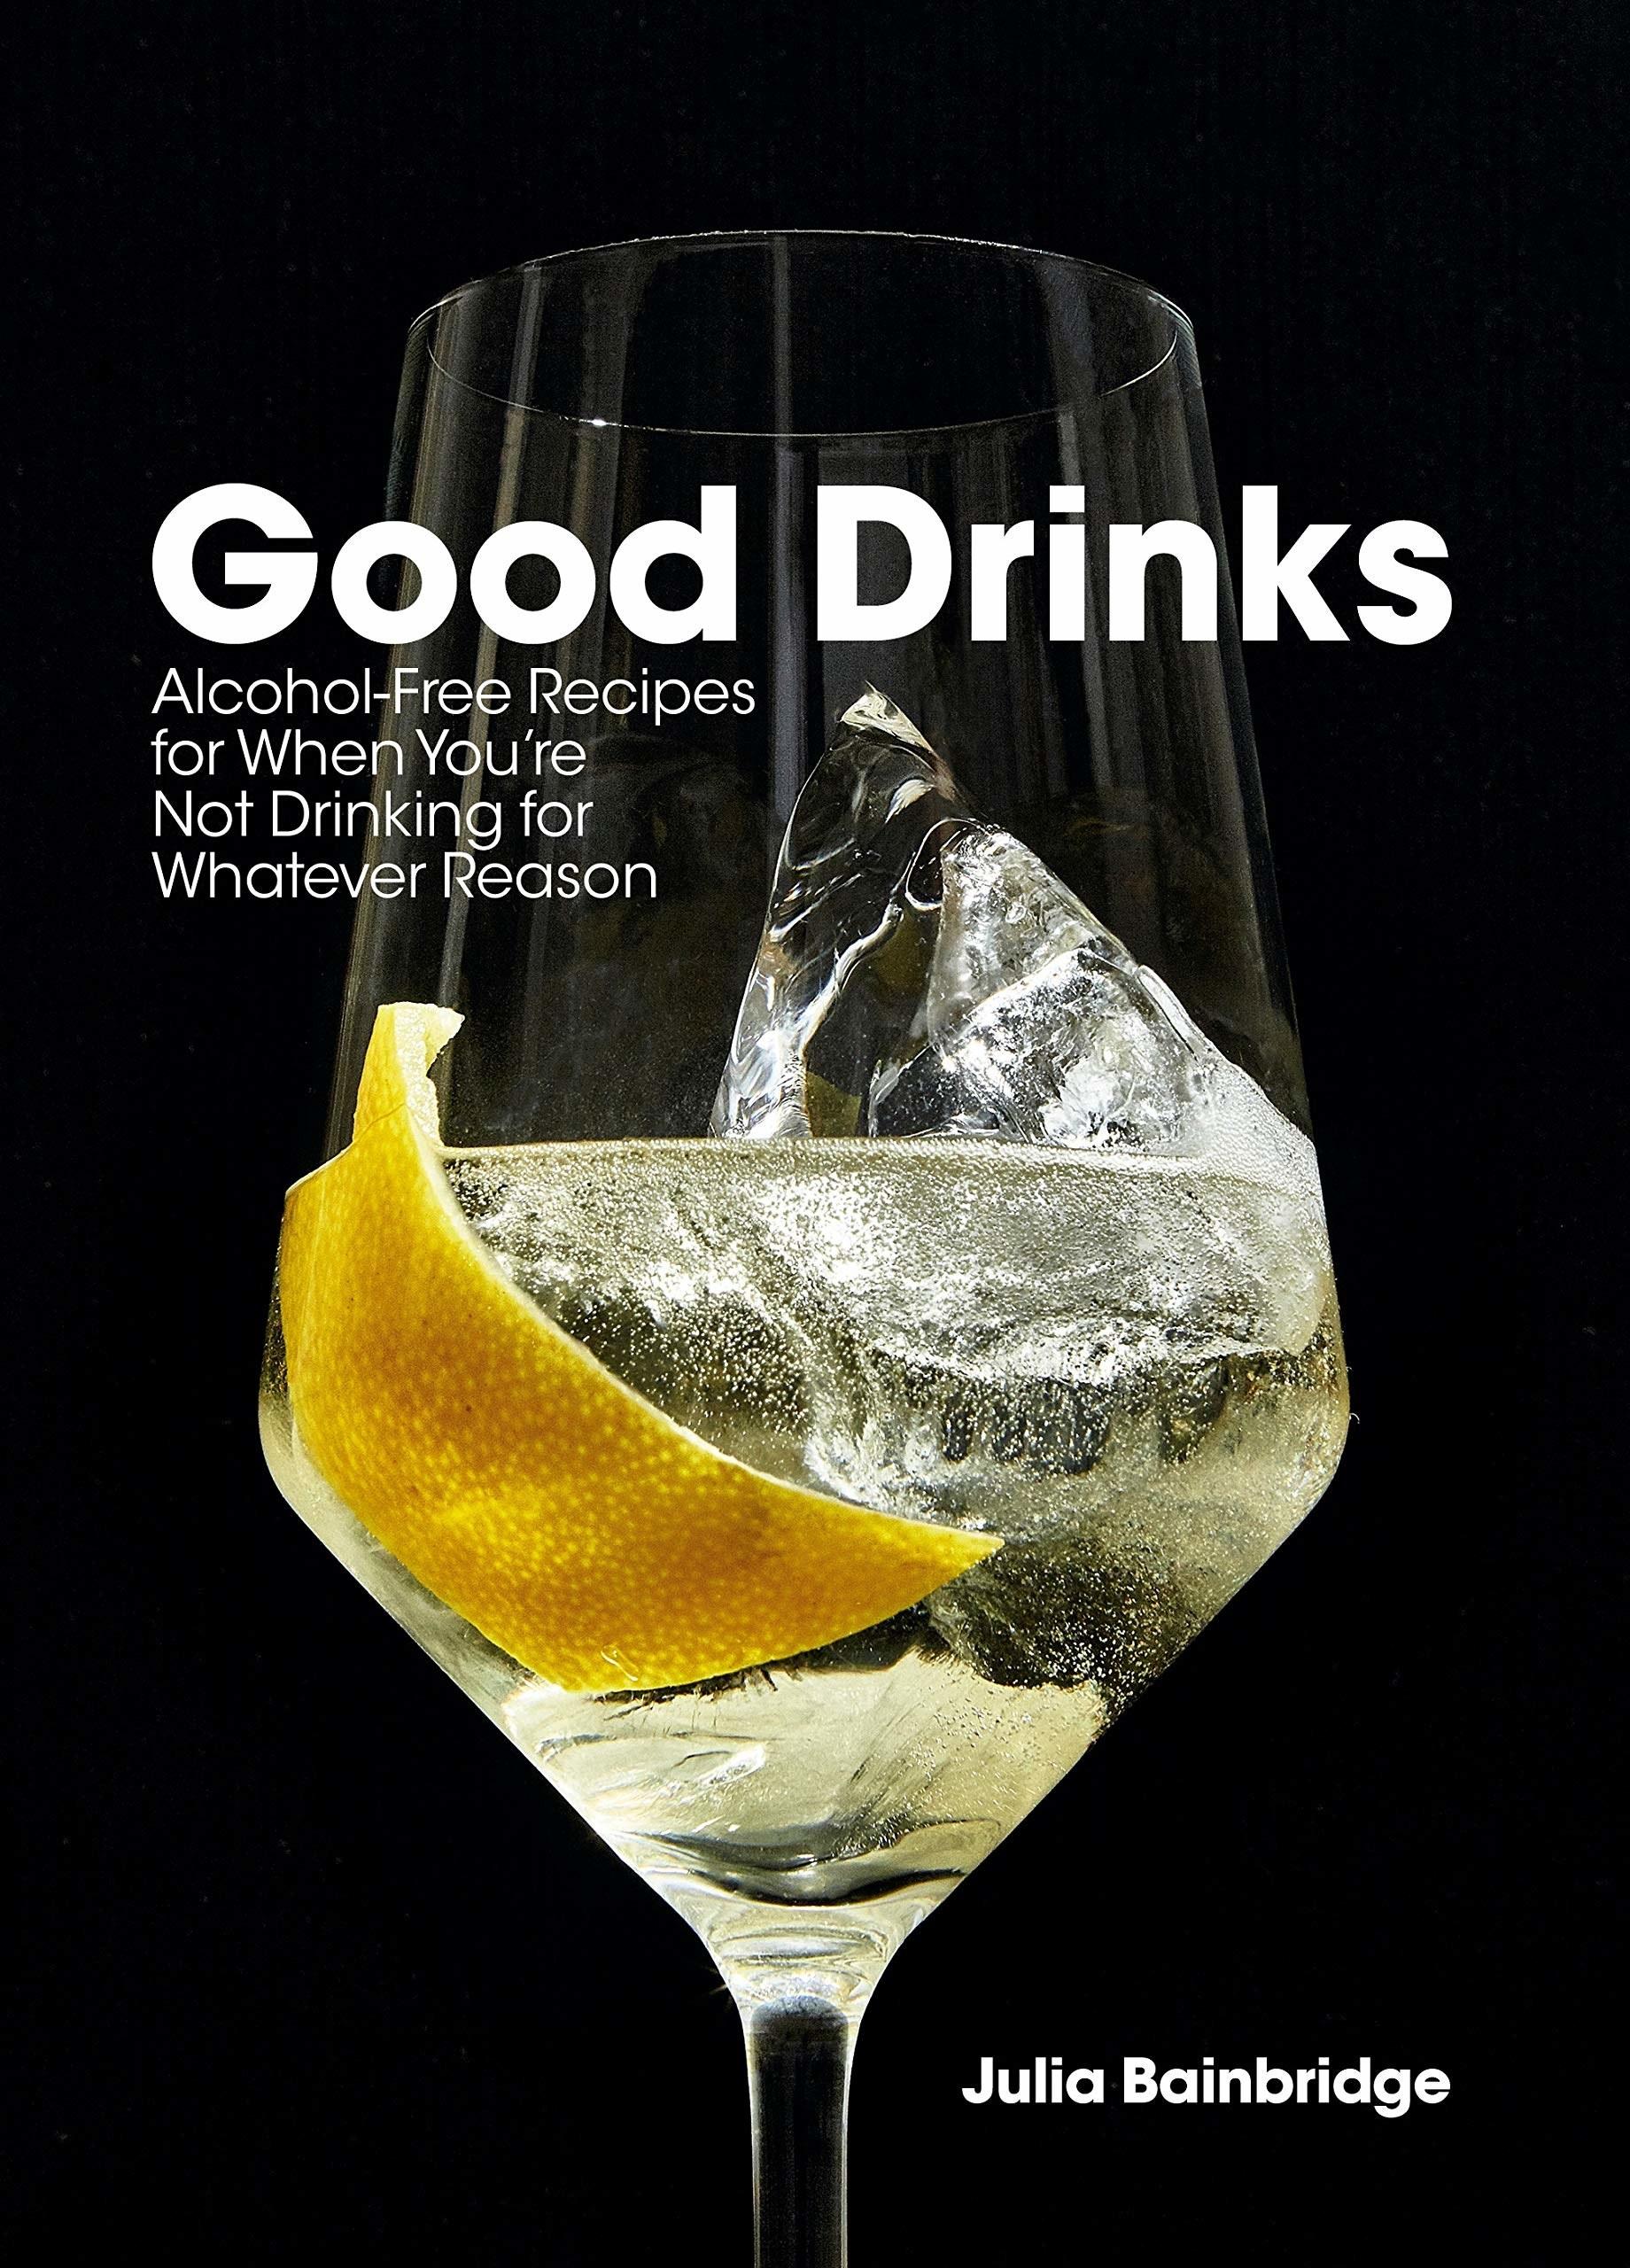 The cover of Good Drinks by Julia Bainbridge